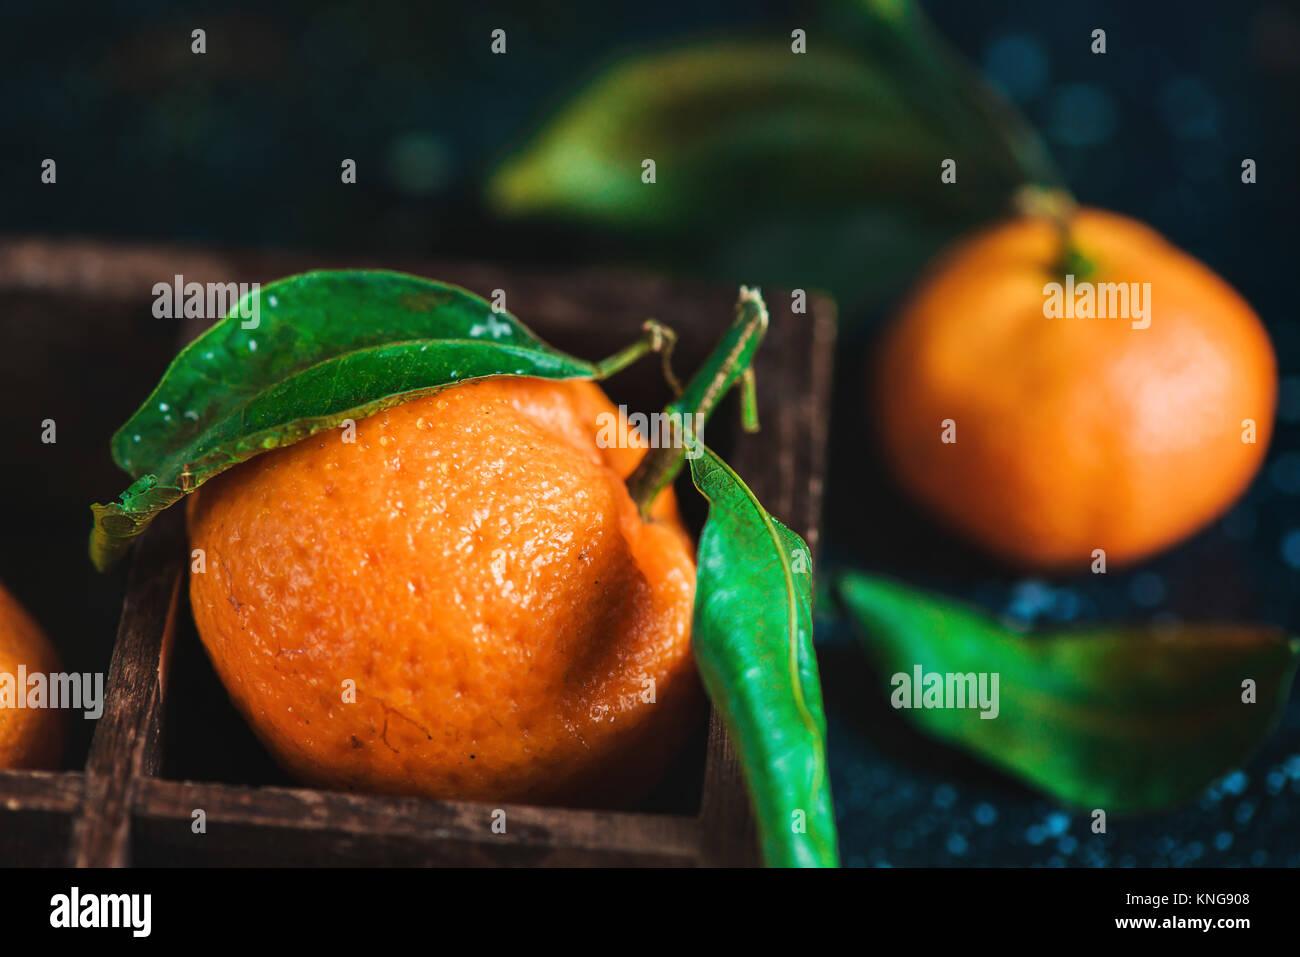 Close-up de mandarinas en una caja de madera sobre un fondo oscuro. Gotas de agua sobre una superficie. Fotografía Imagen De Stock